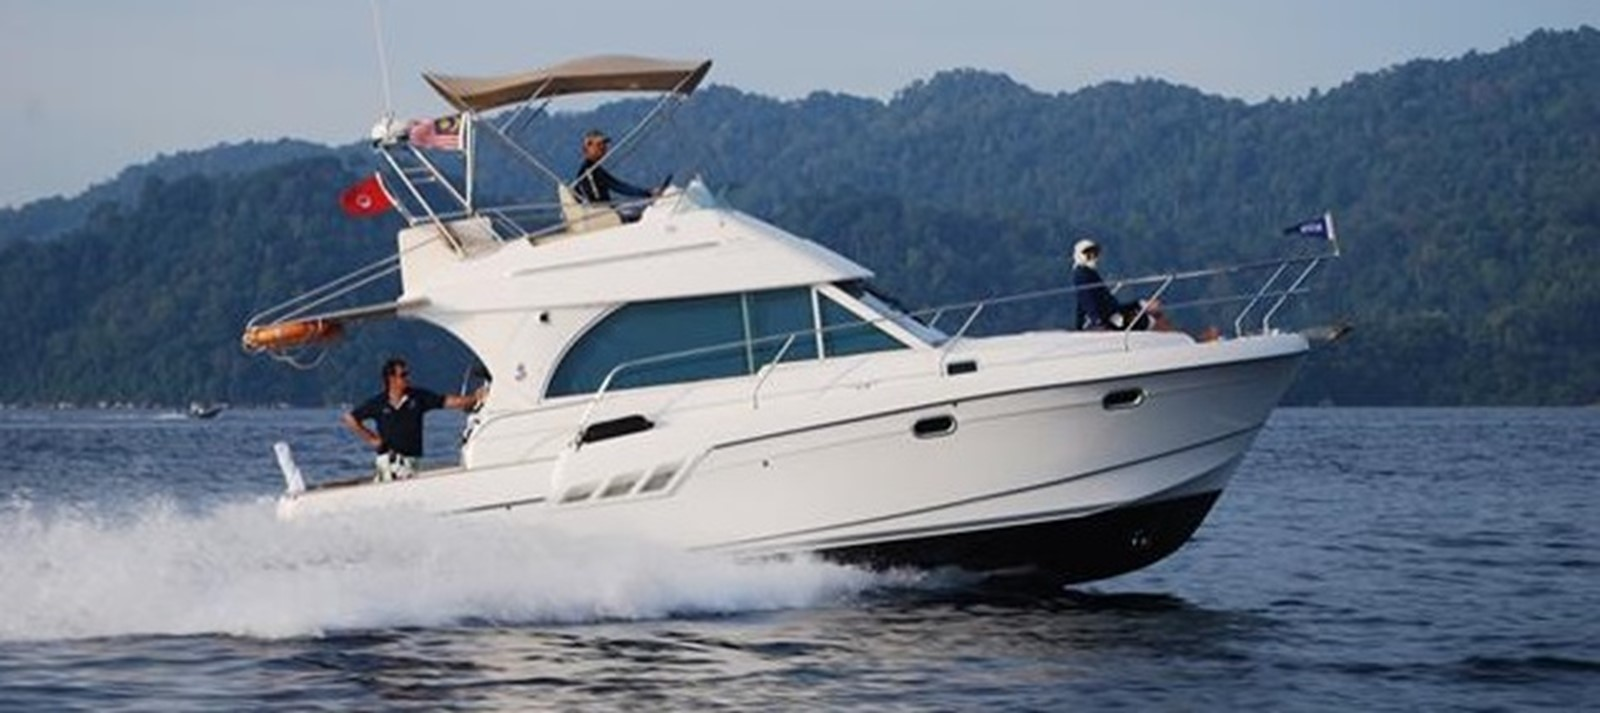 2007 BENETEAU Beneteau Antares 9.8 Motor Yacht 1012700